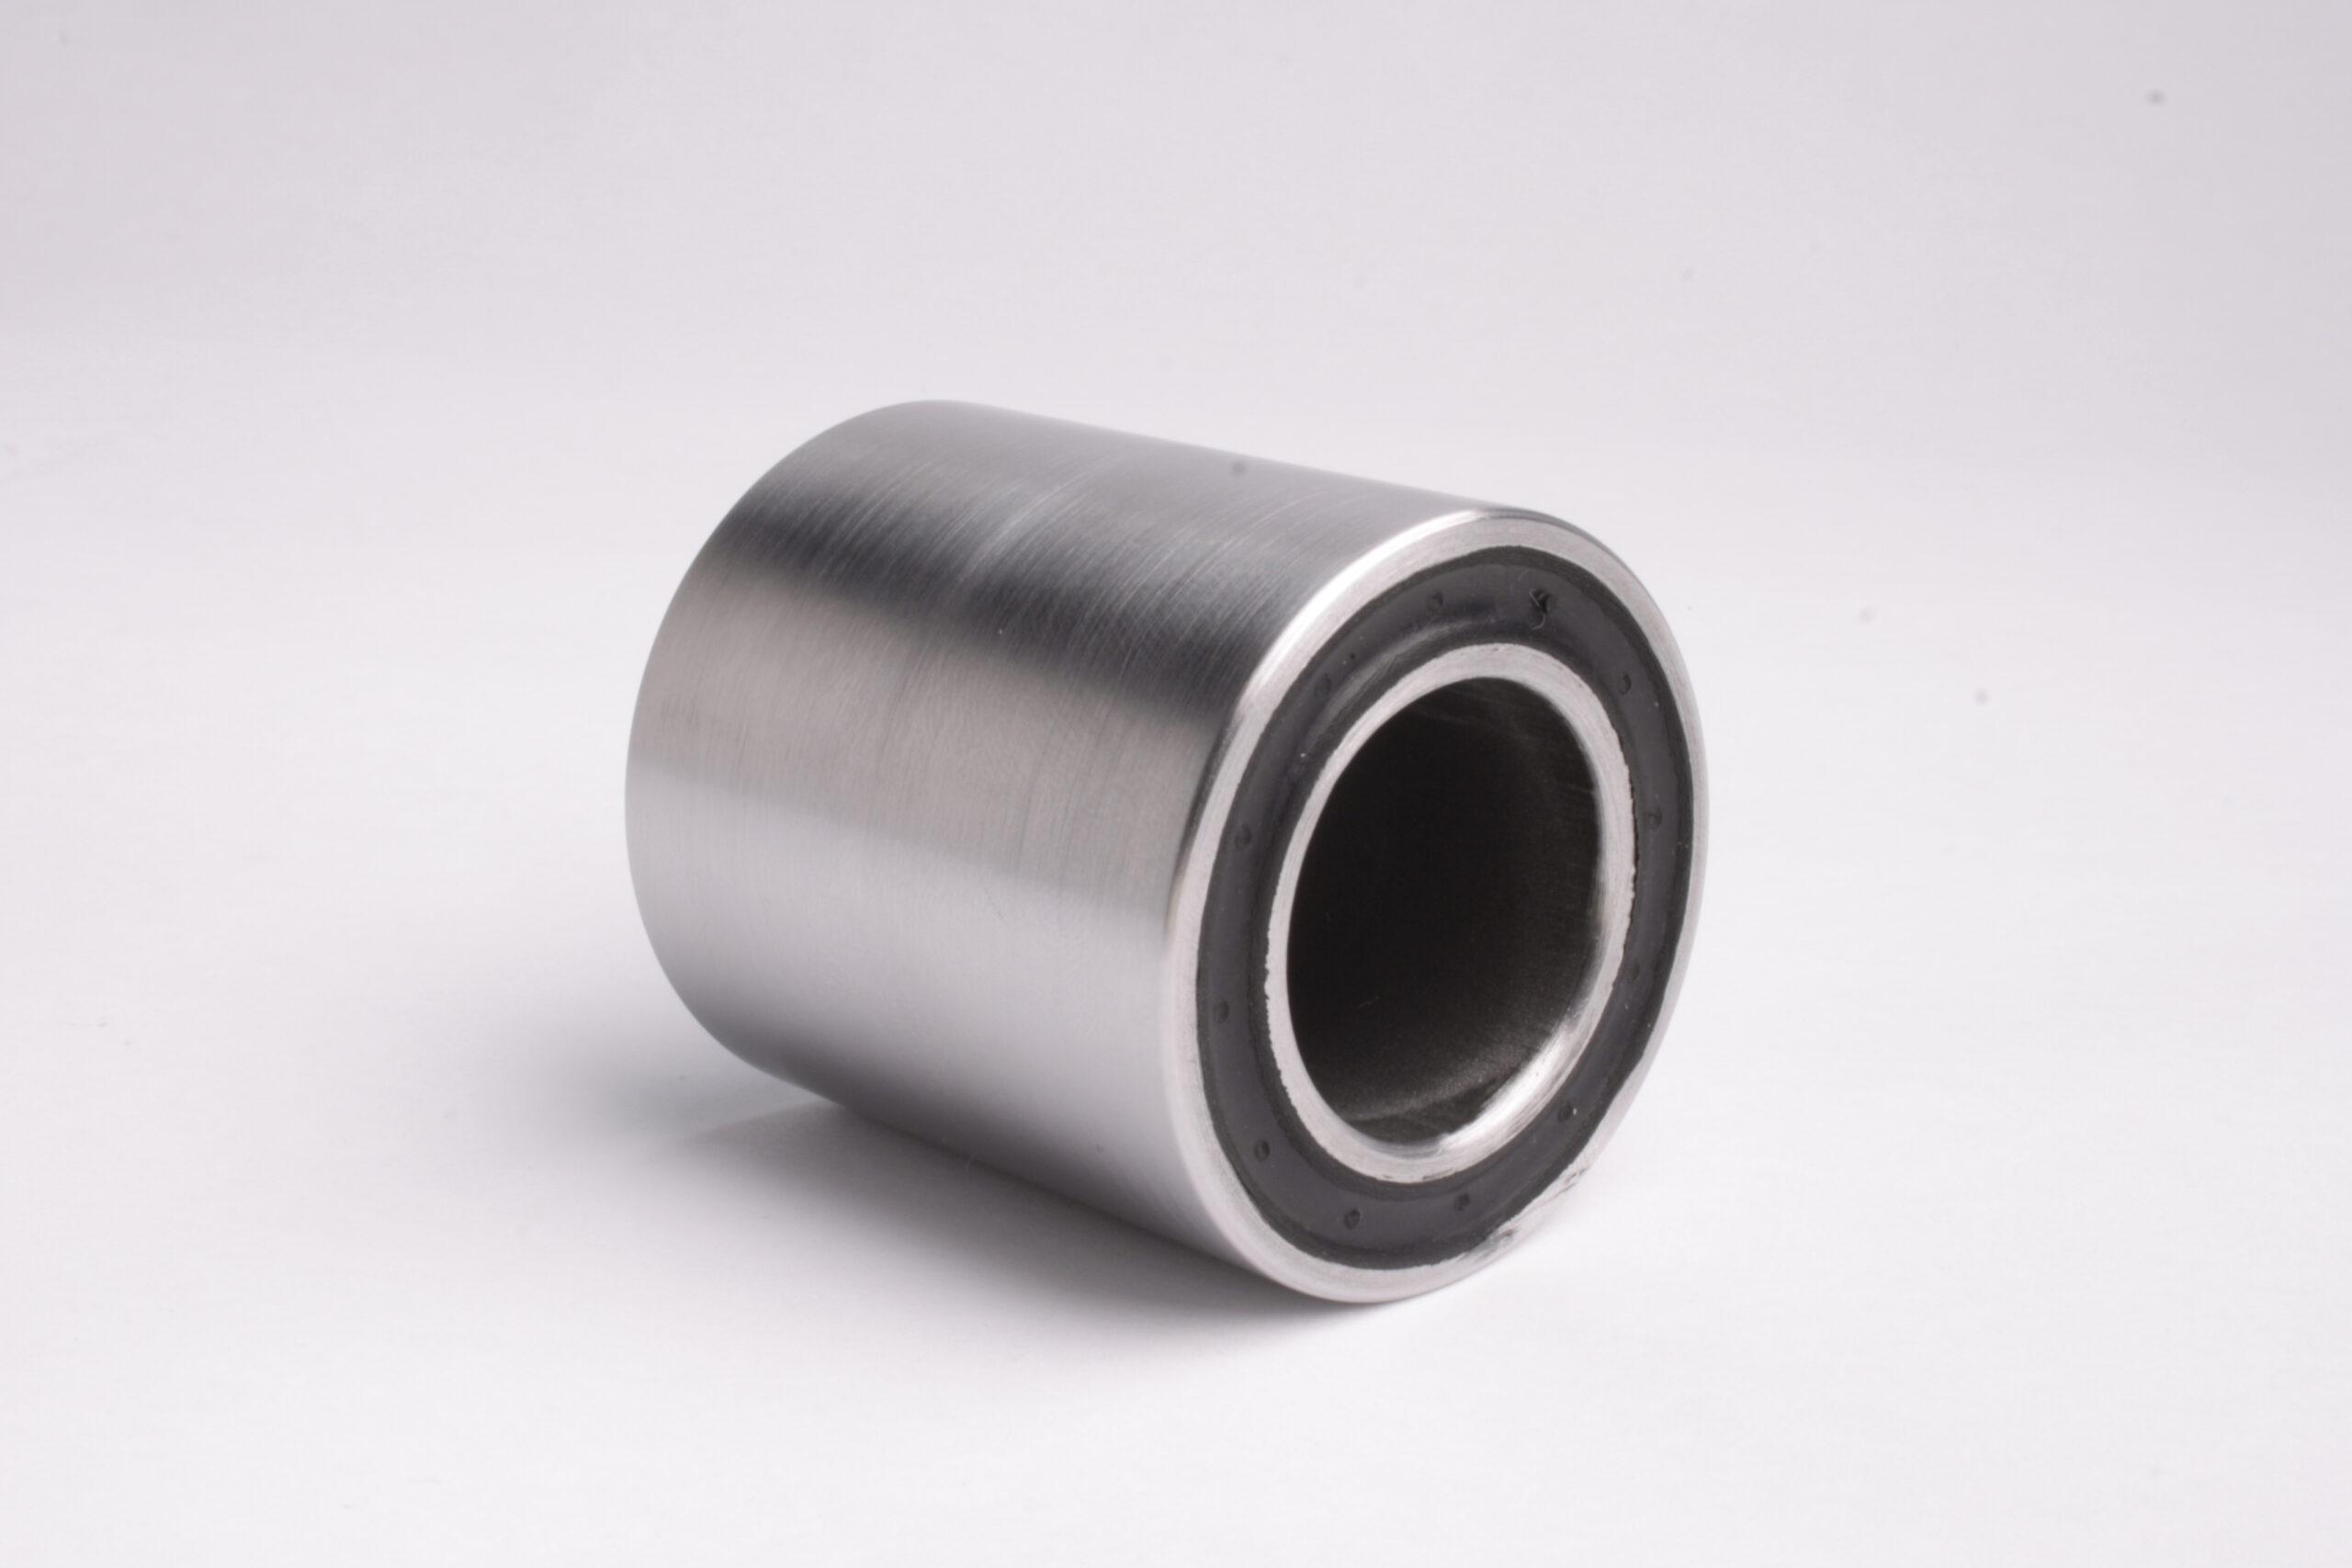 Dämpferbuchse Gummi Metall Verbindung